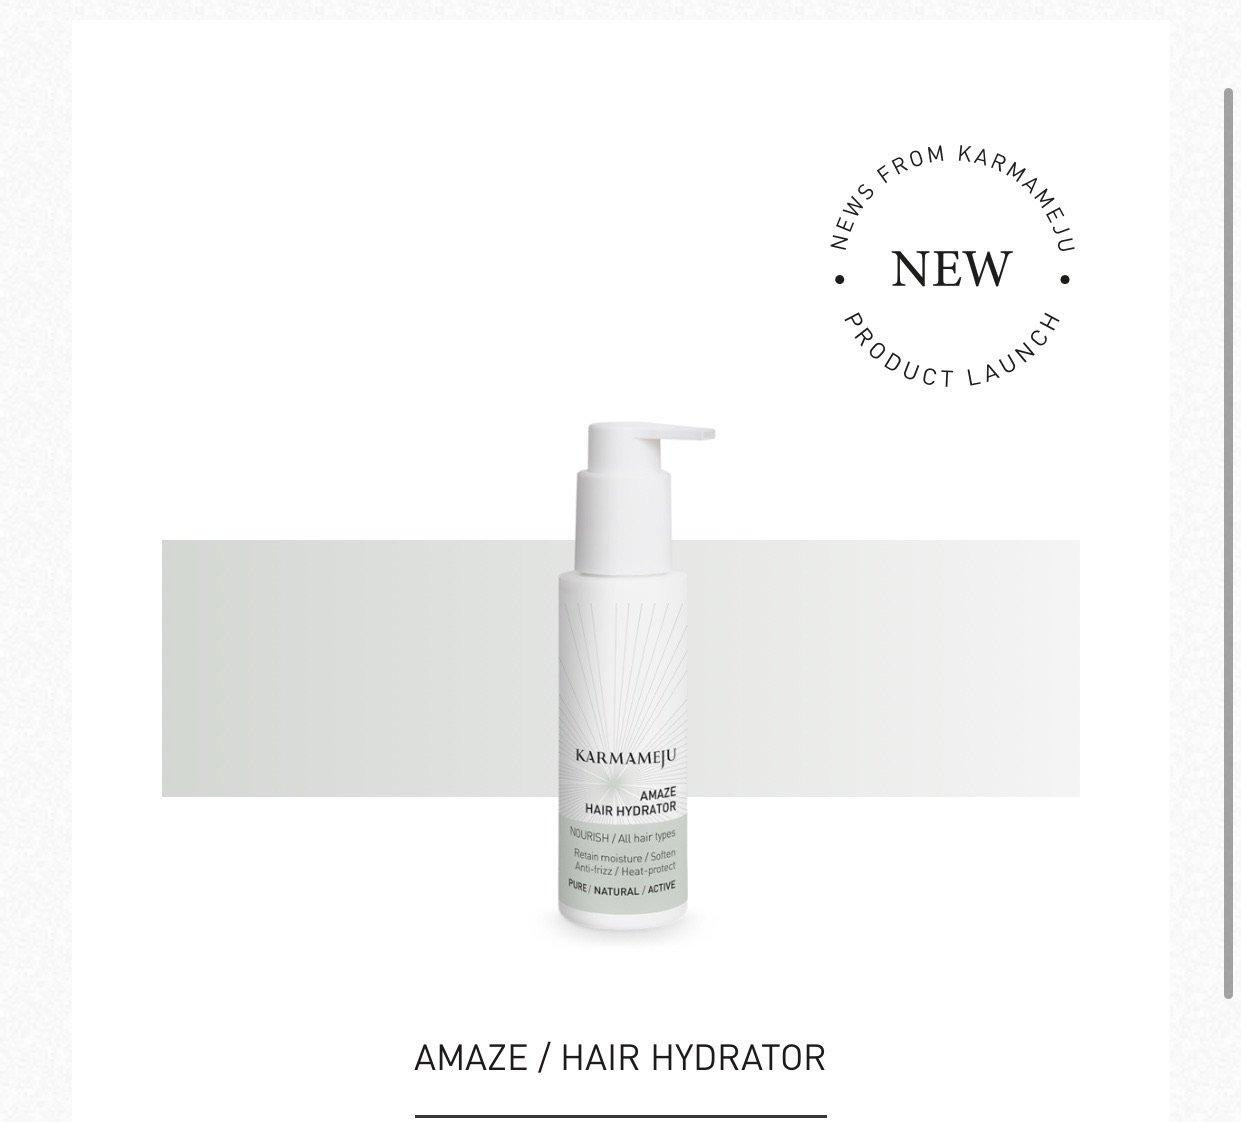 Amaze/Hair hydrater Karmameju